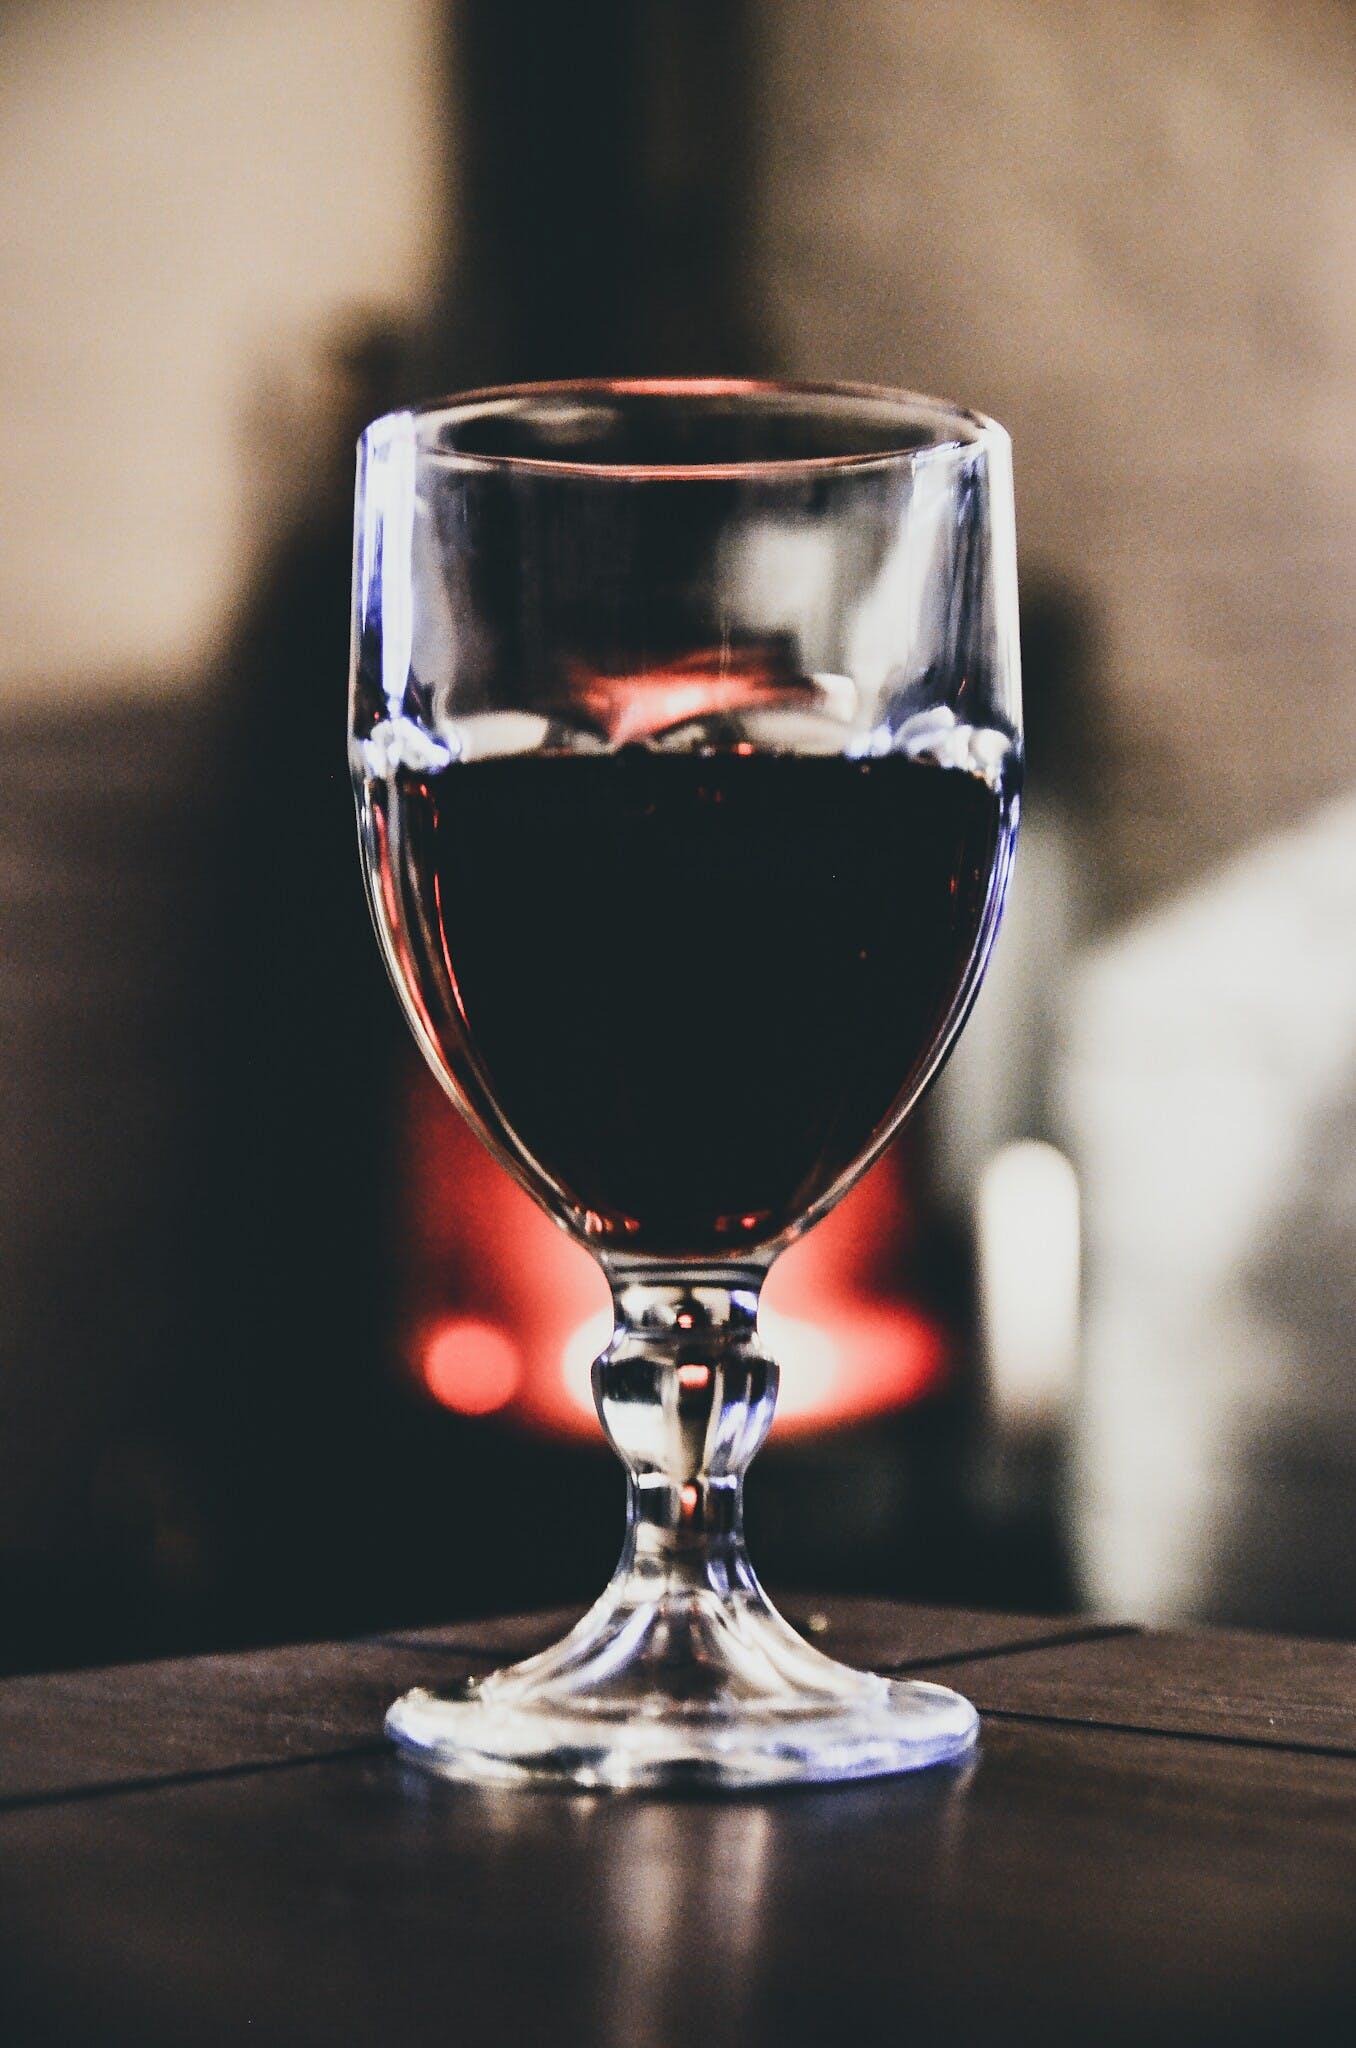 Free stock photo of wine glass